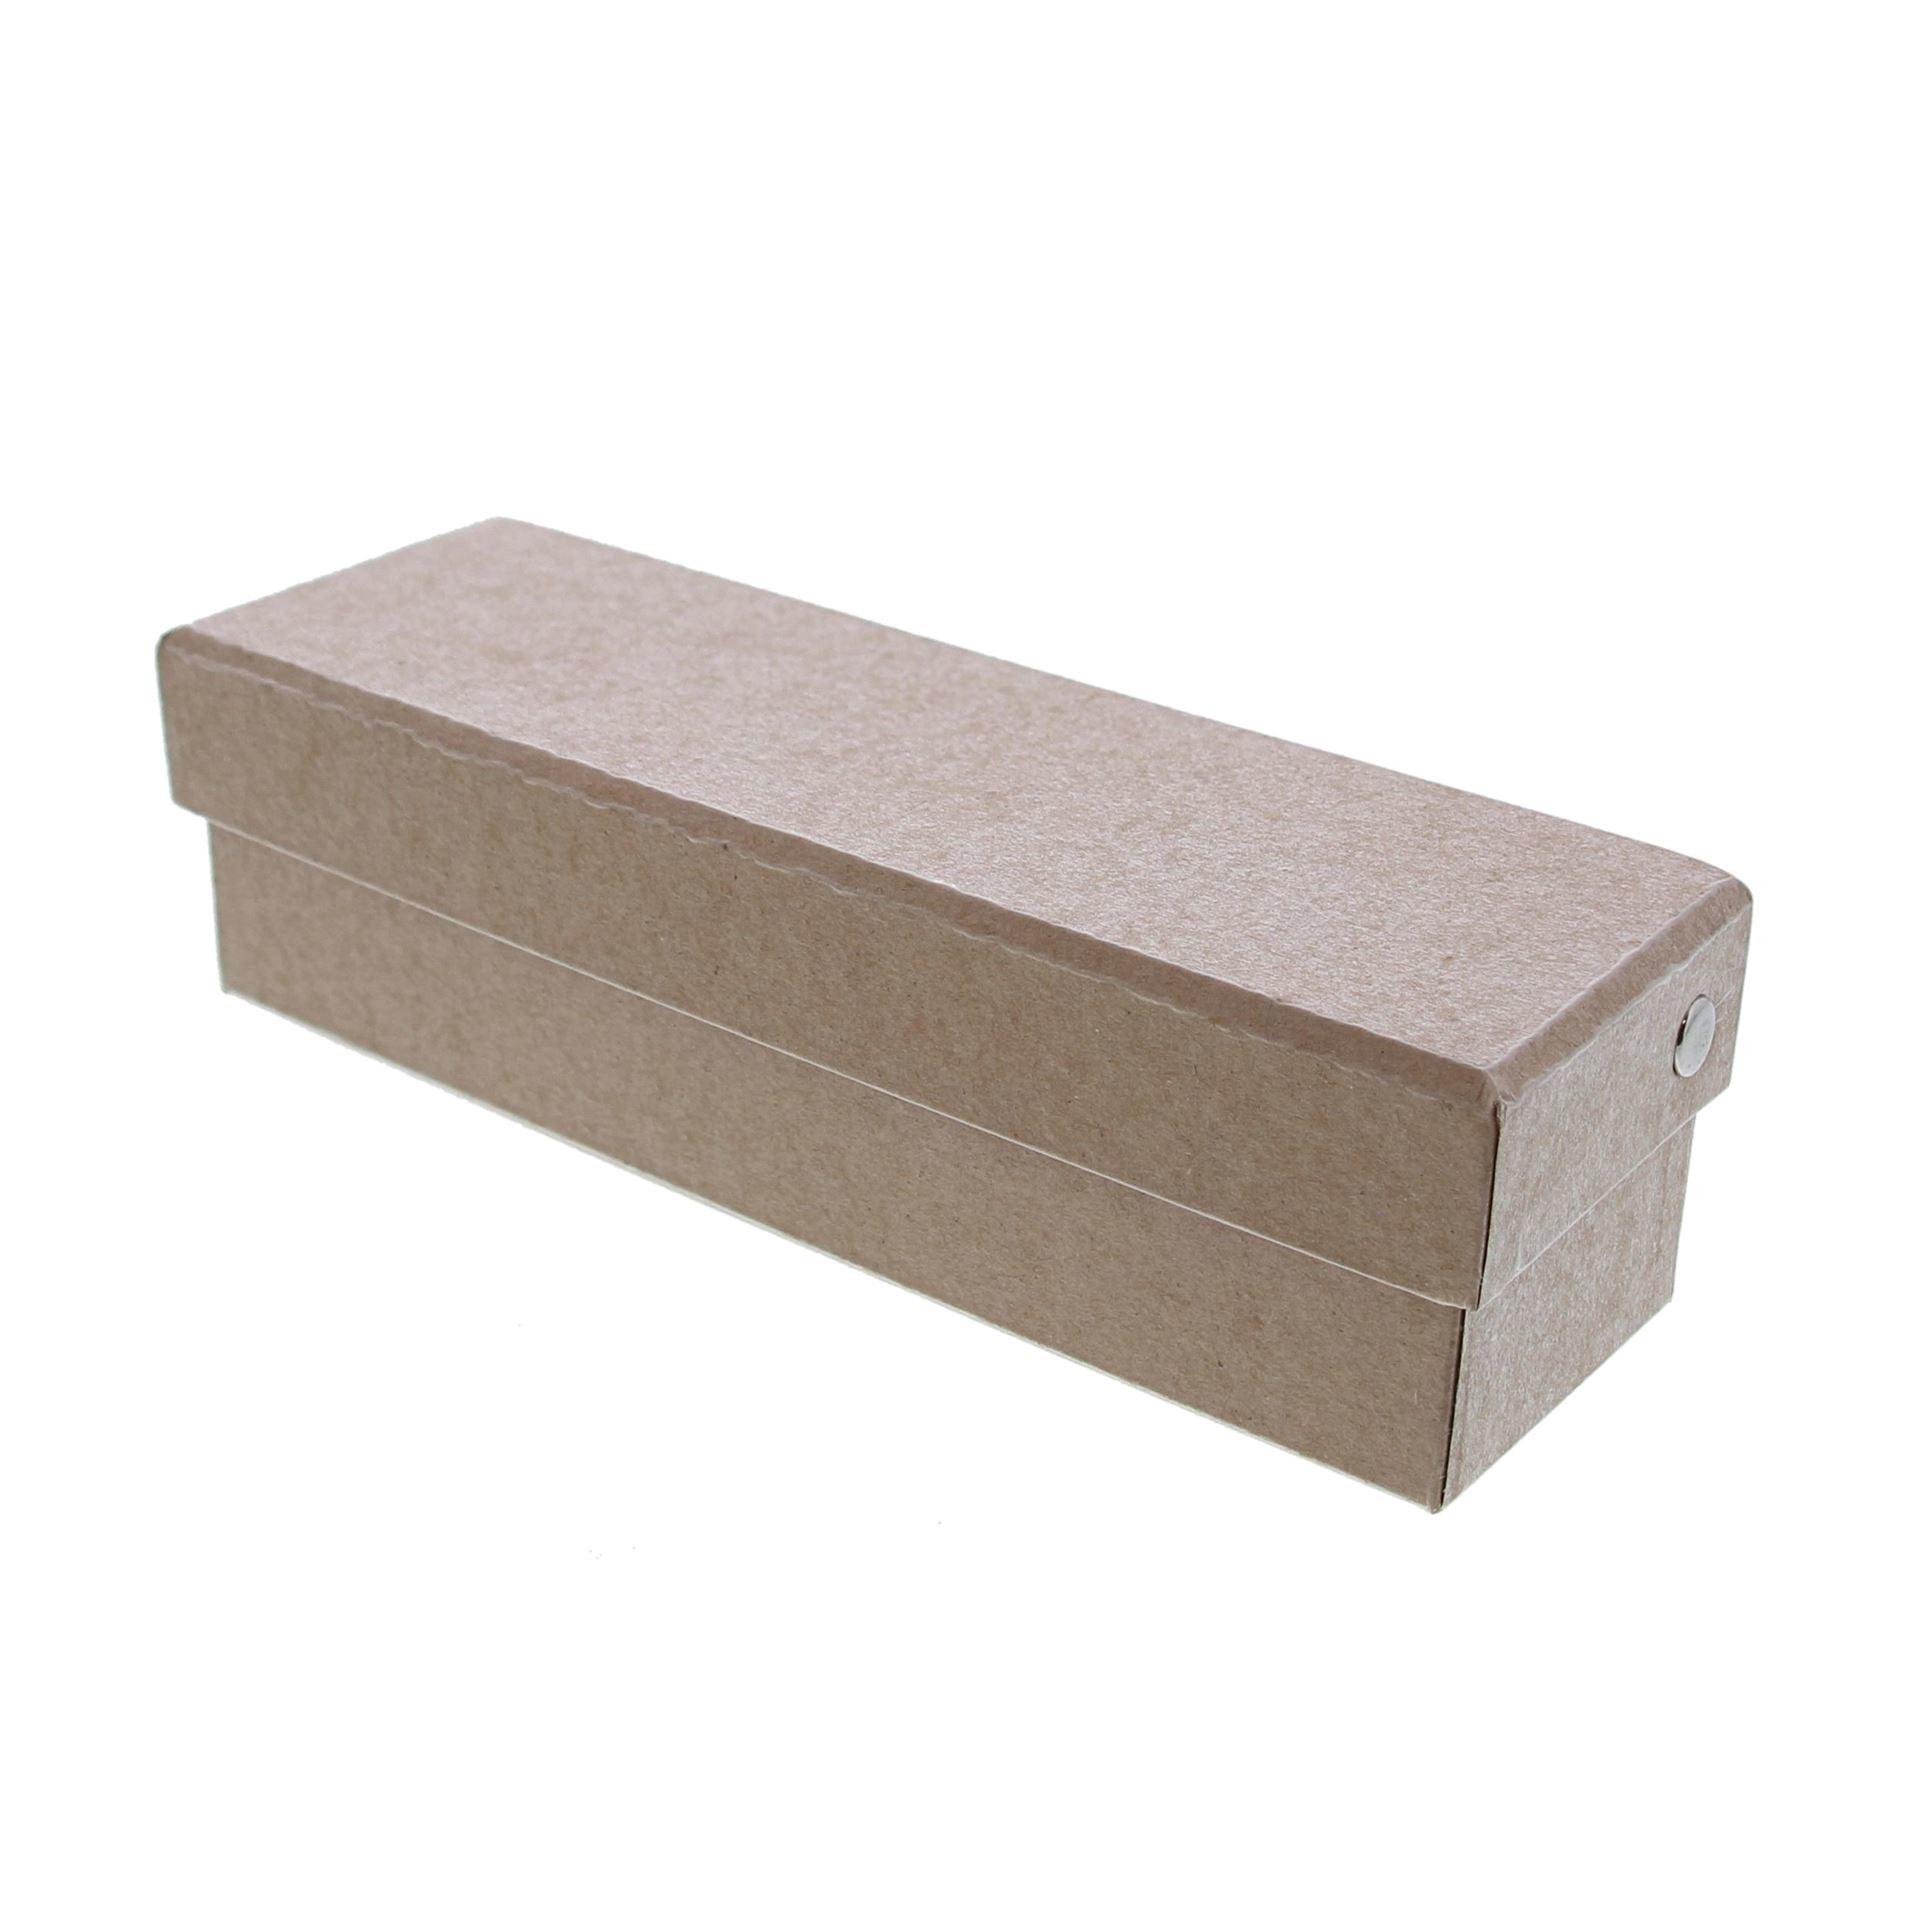 Kraft rectangular Box with lid - 190*60*55mm - 10 pieces